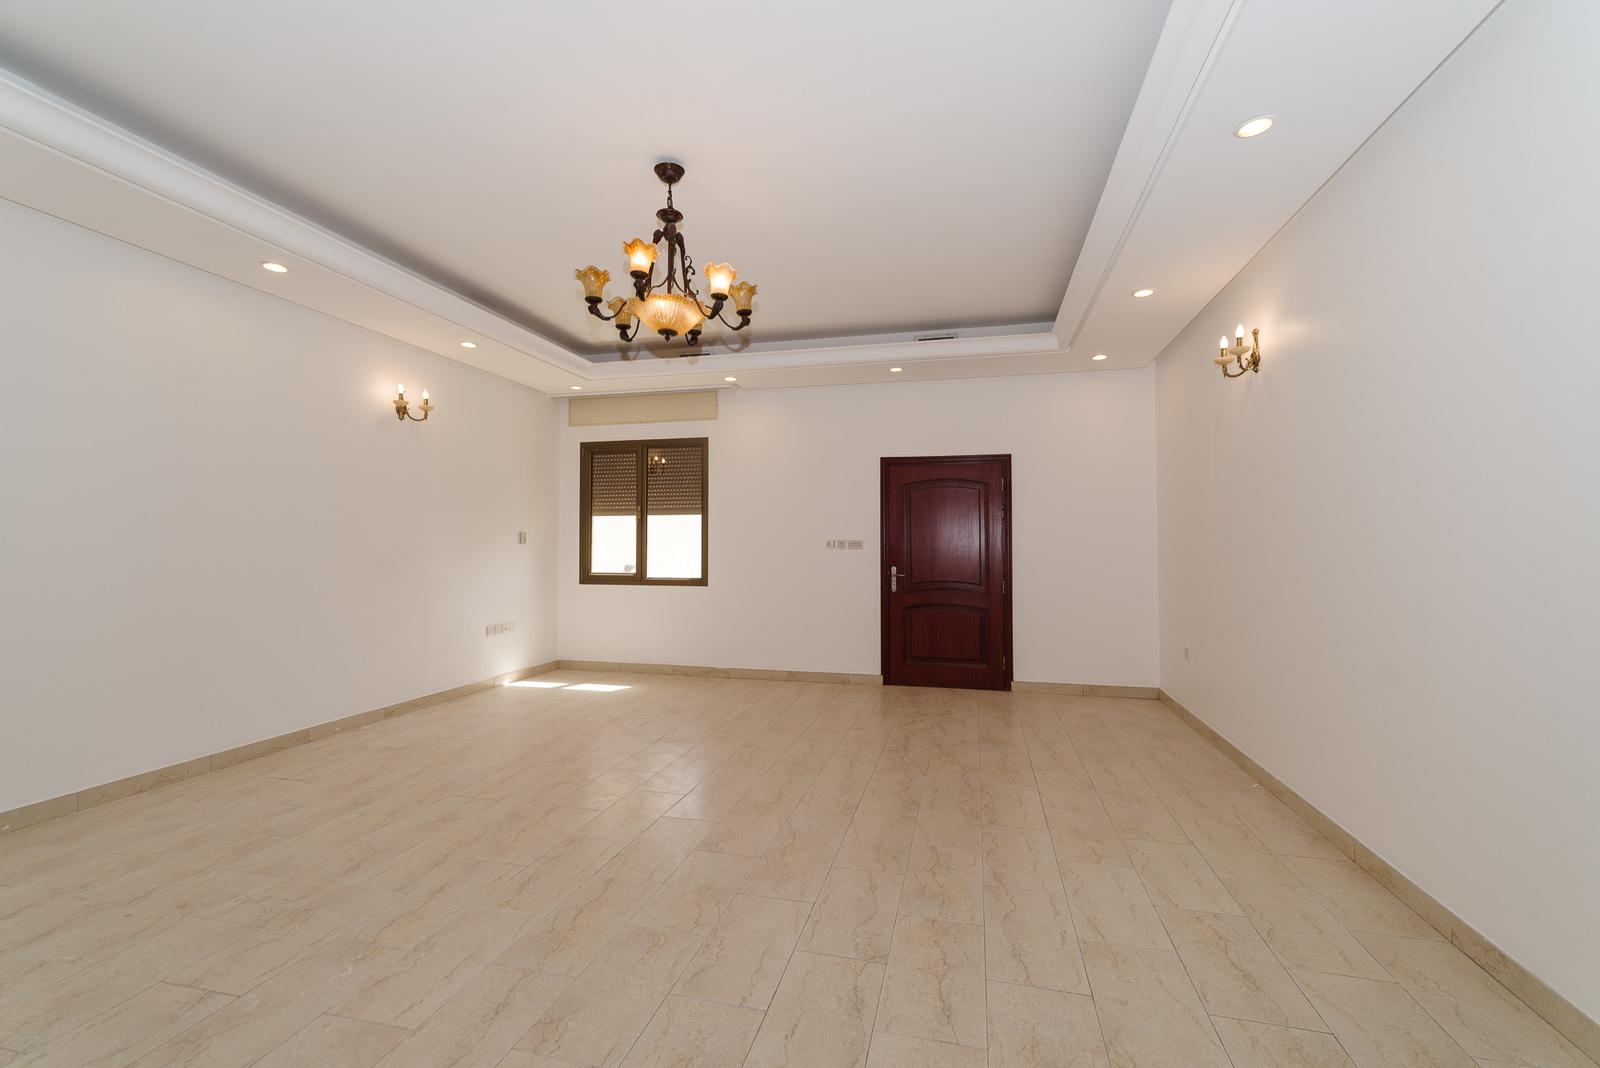 Rumathiya – spacious, unfurnished, five bedroom part of a villa